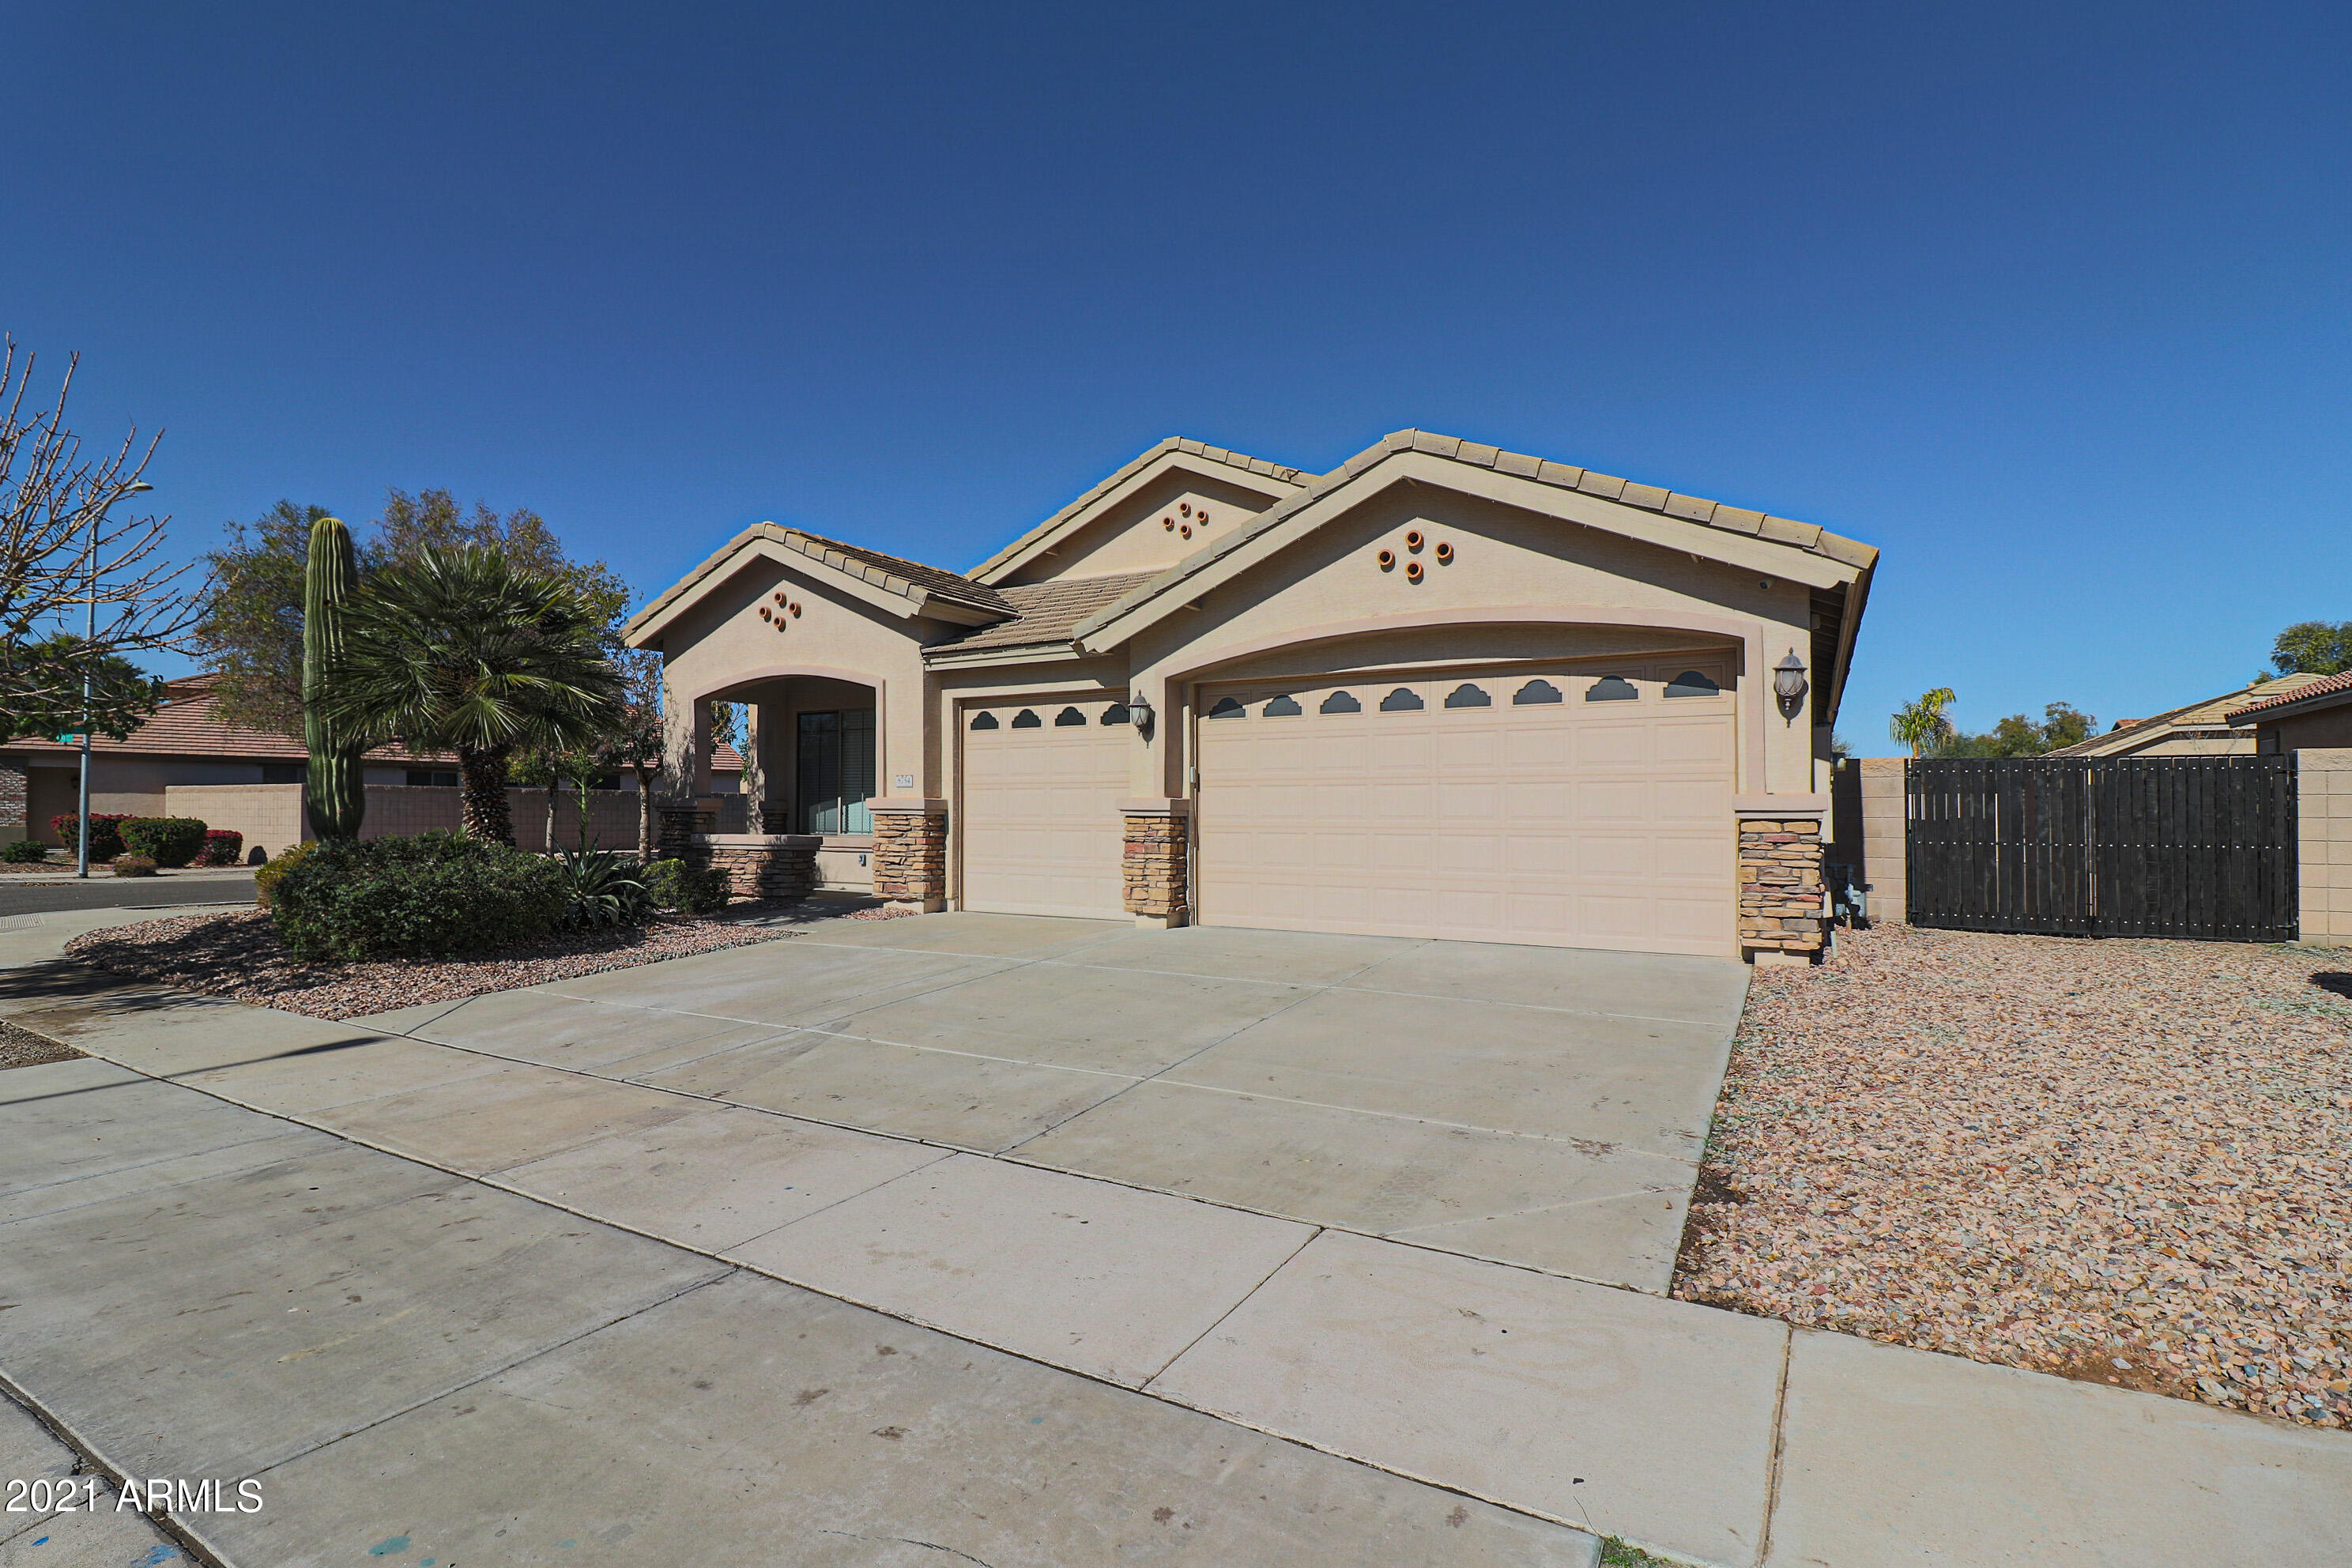 8754 W Palmaire Avenue, Glendale AZ 85305